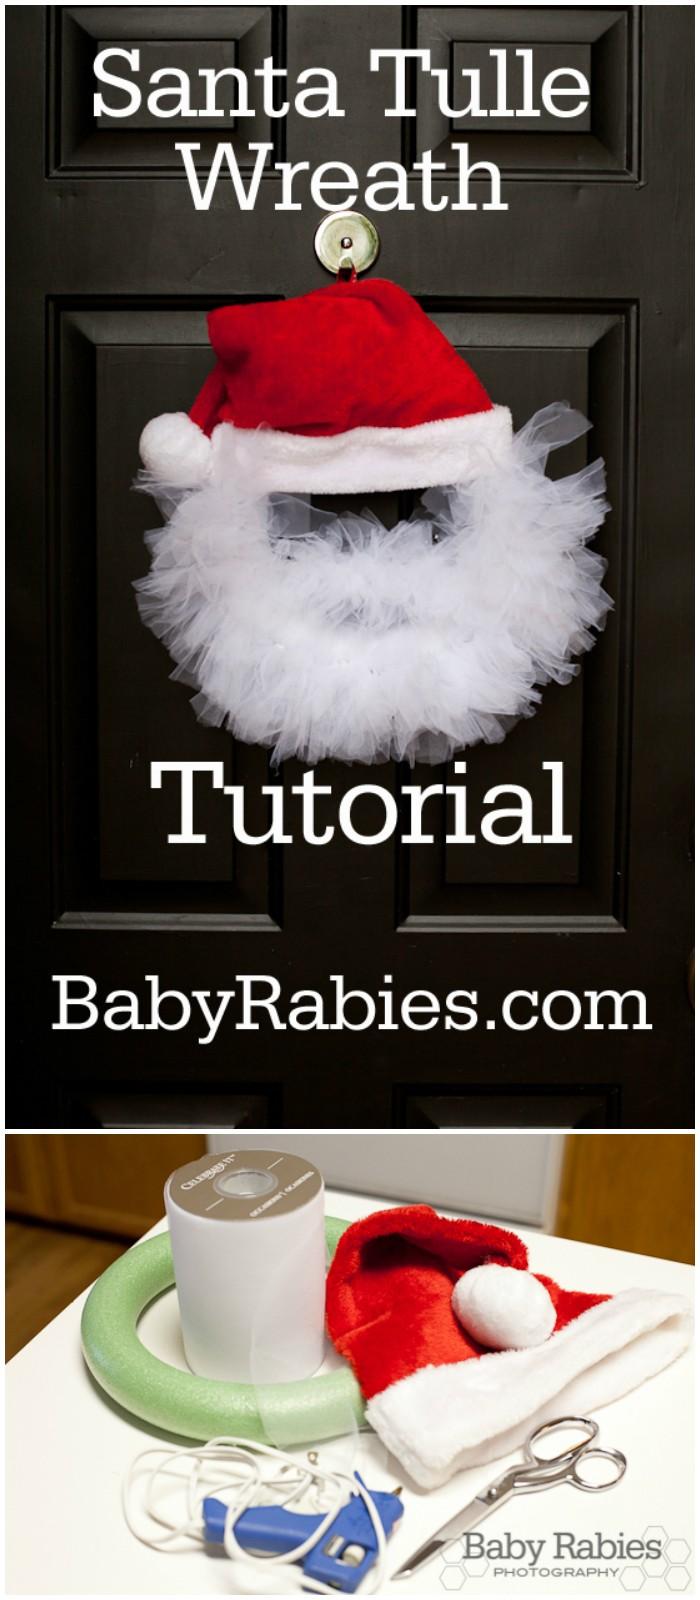 Santa Tulle Wreath Tutorial Baby Rabies | Autos Post - photo#2